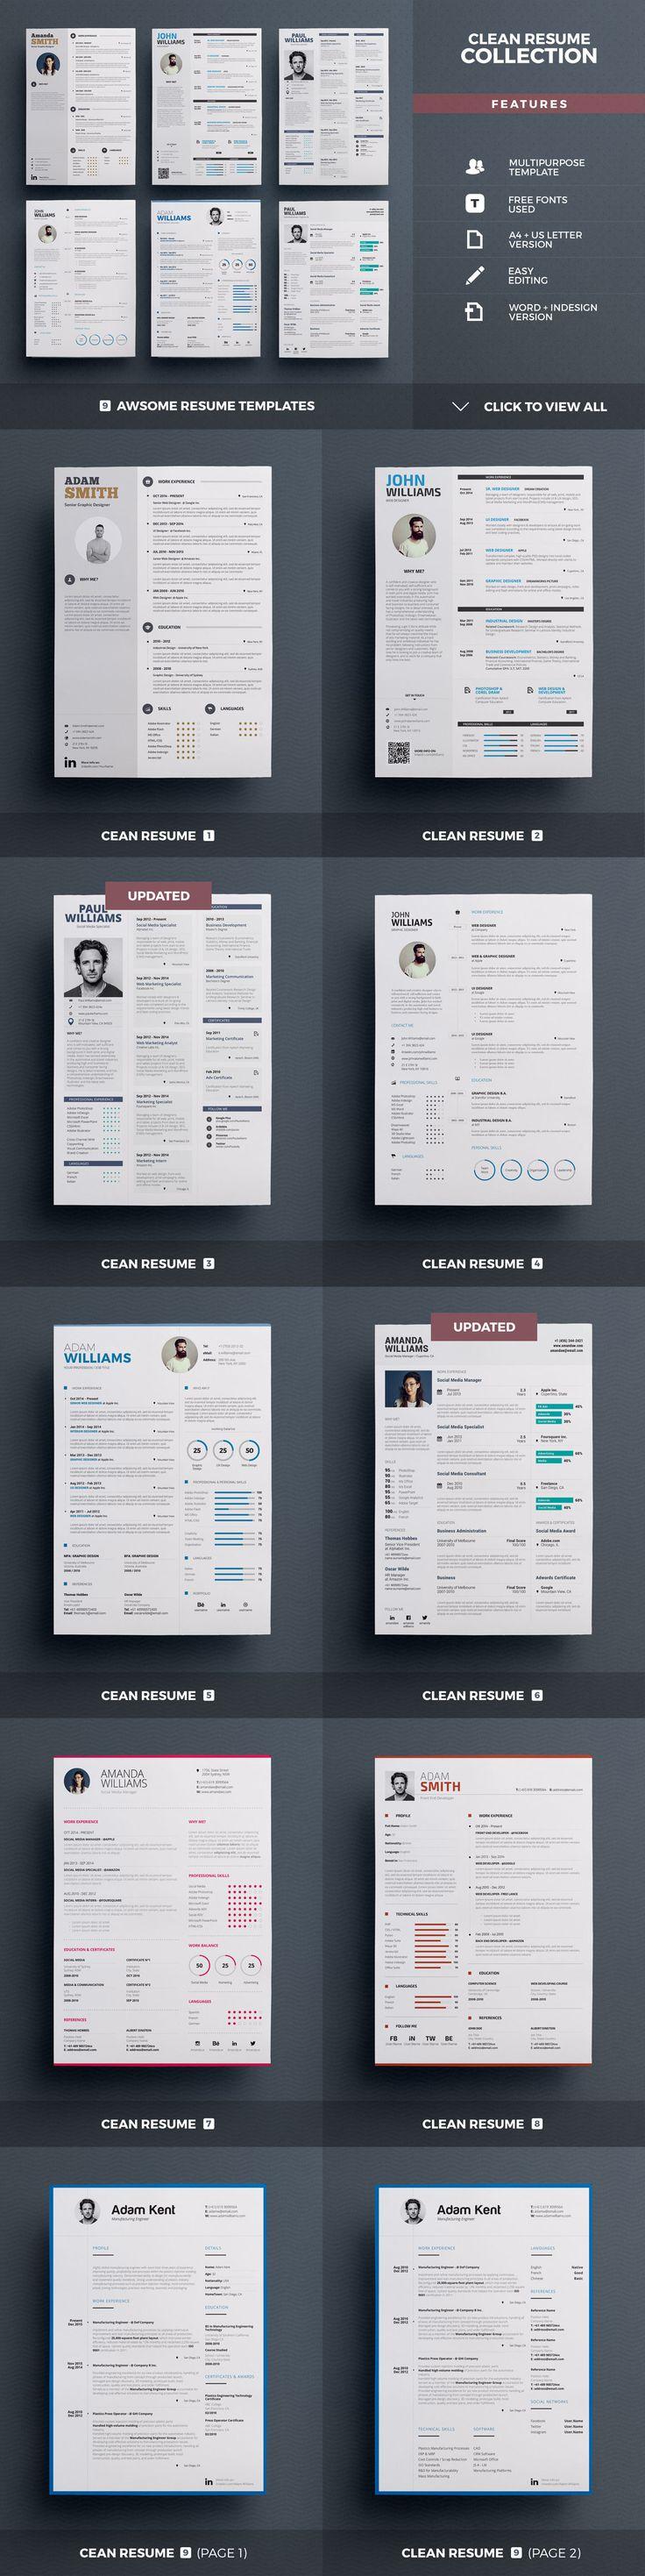 84 best Work images on Pinterest | Resume design, Resume templates ...